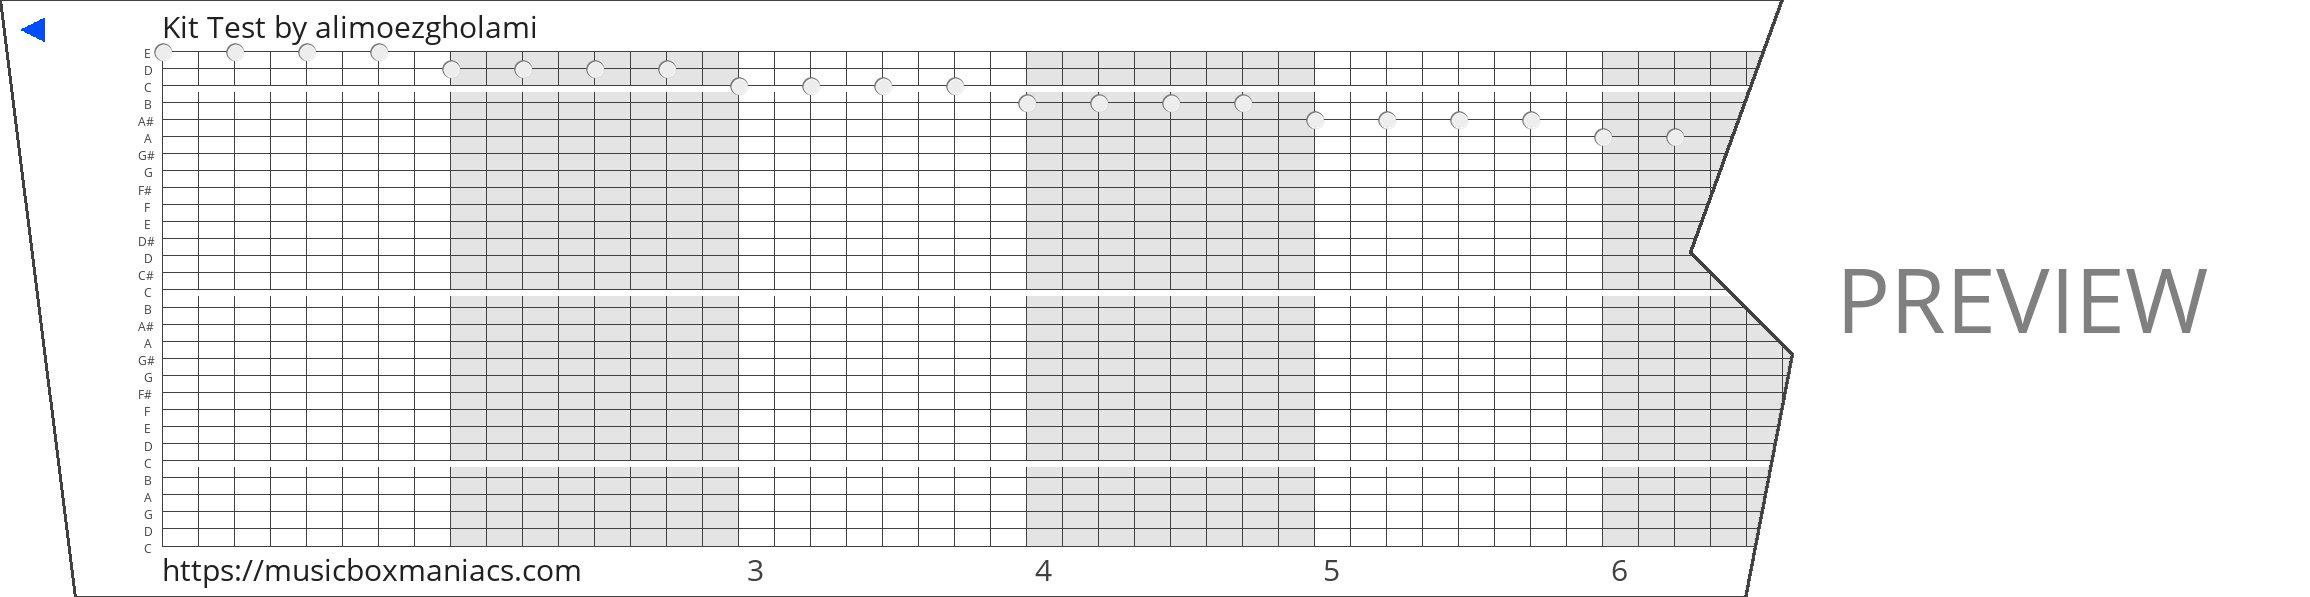 Kit Test 30 note music box paper strip